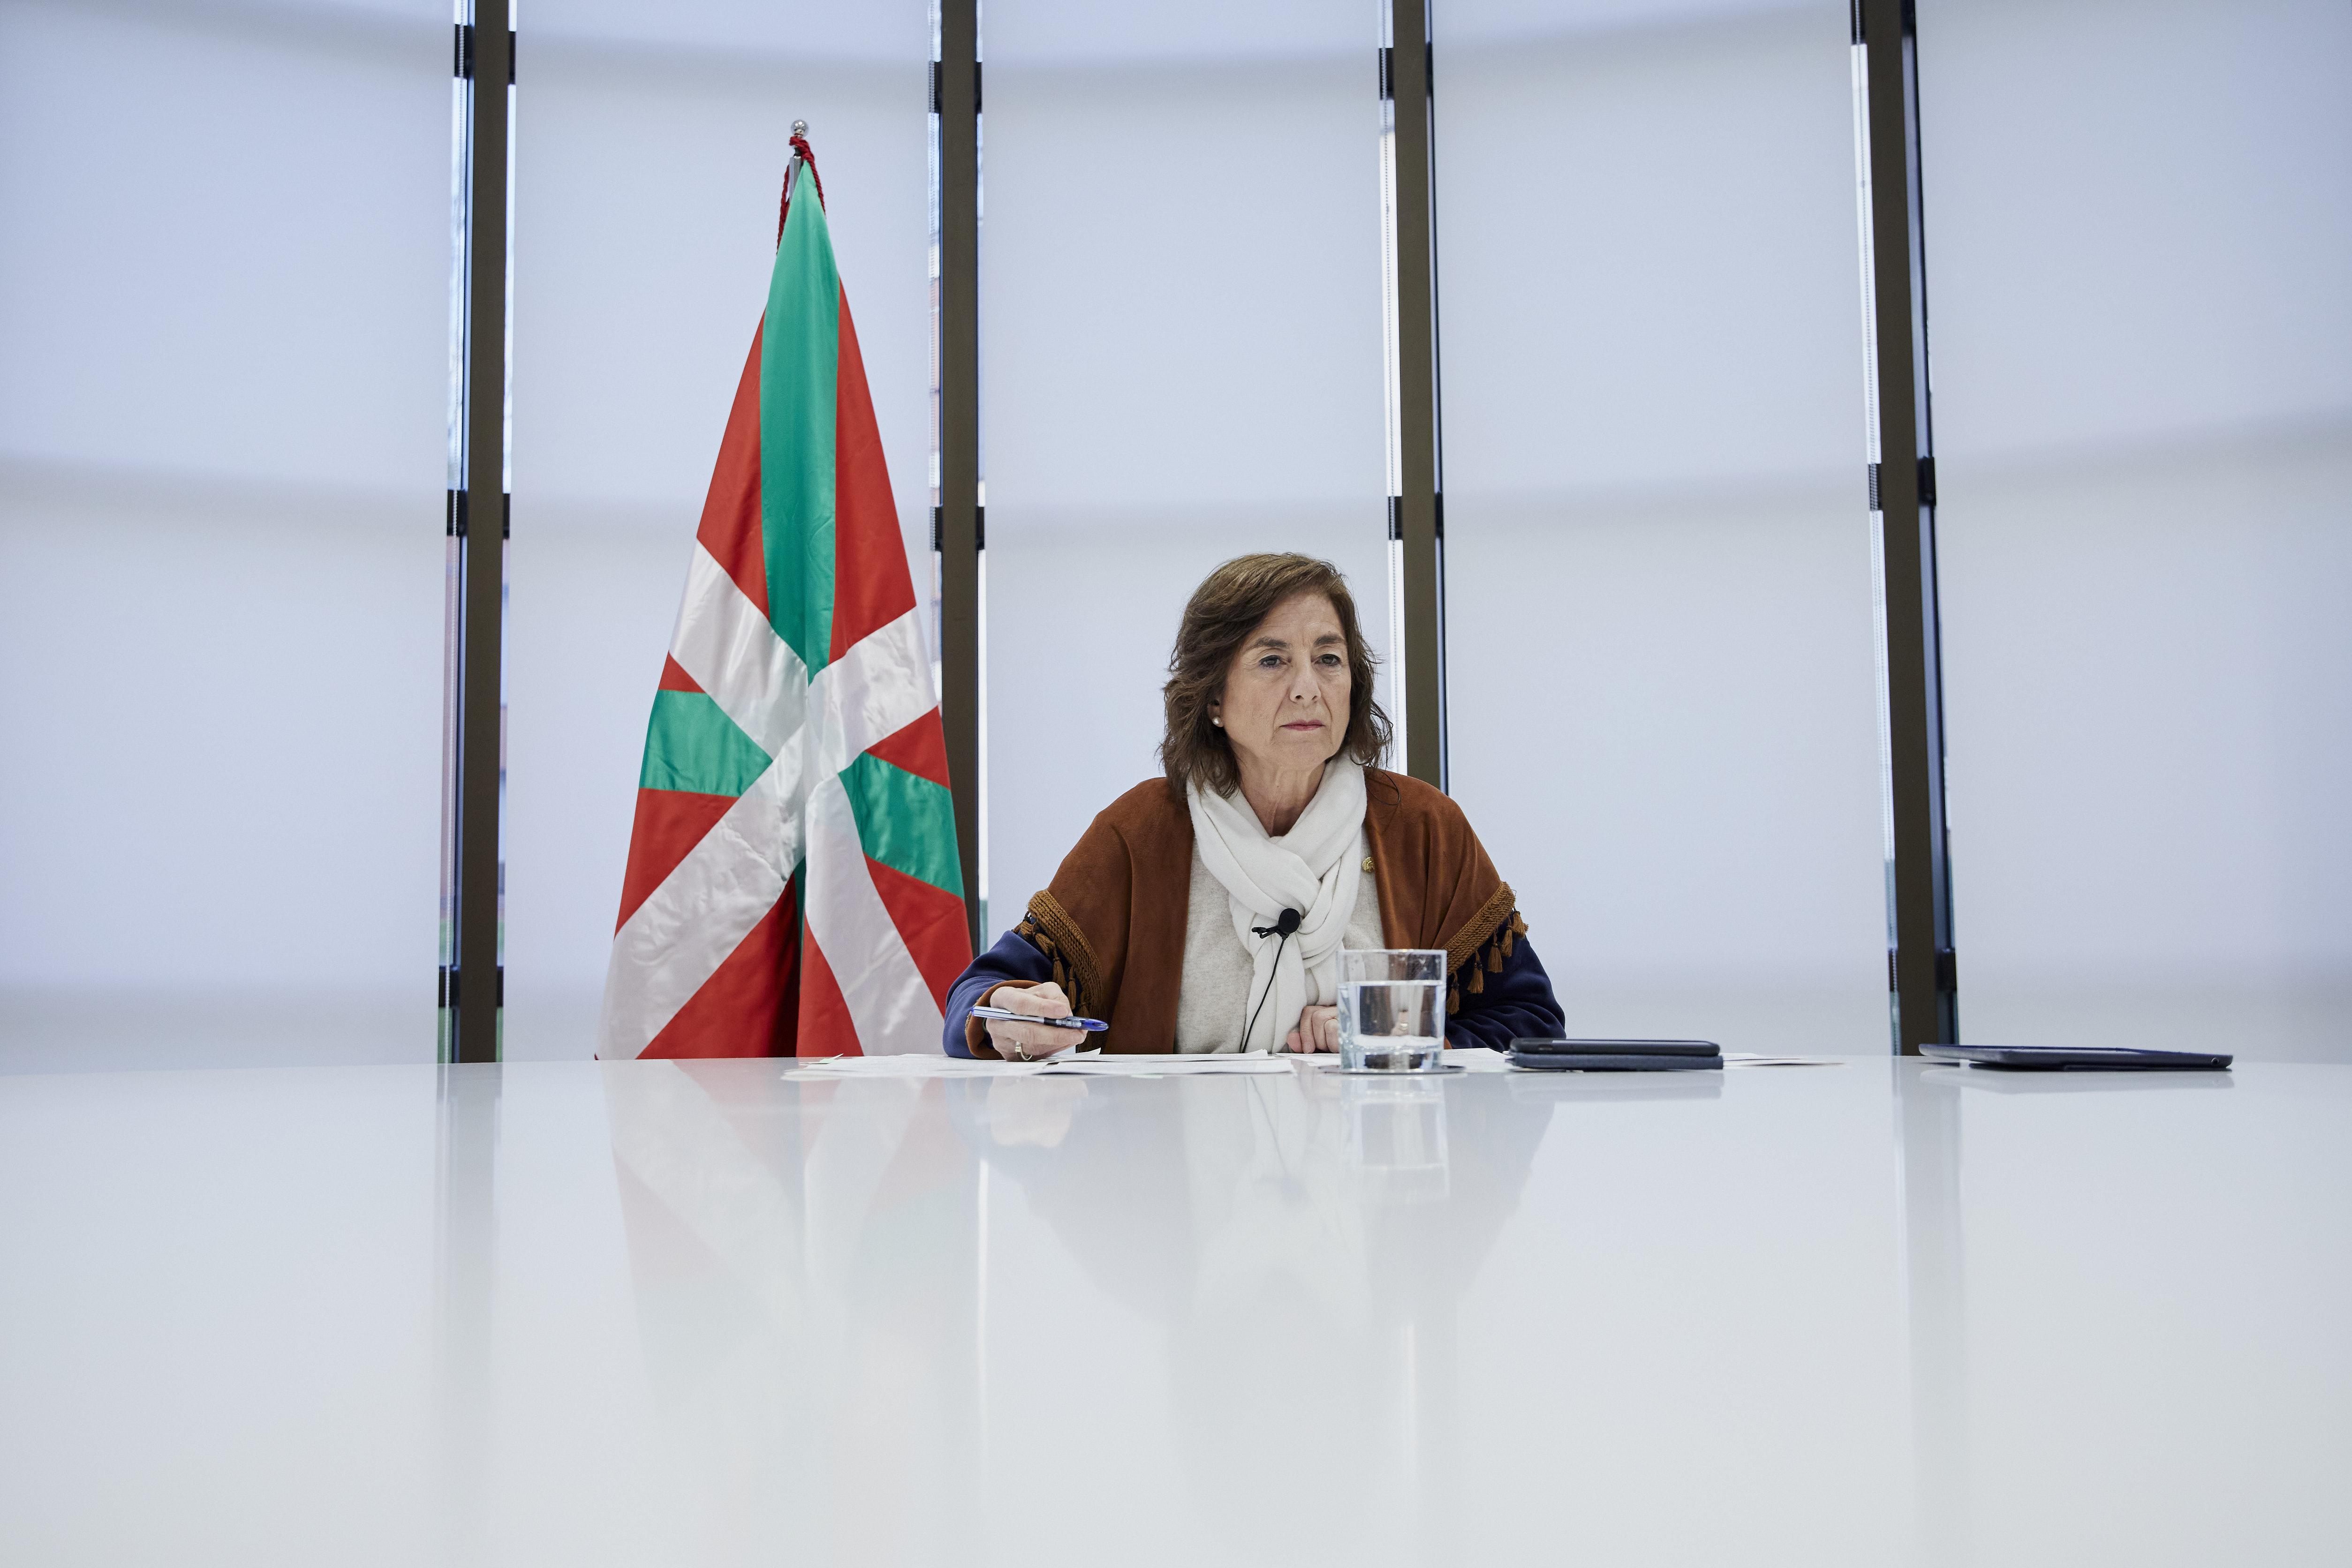 2020.04.08_Uriarte_Euskadi_Irratia_009.jpg